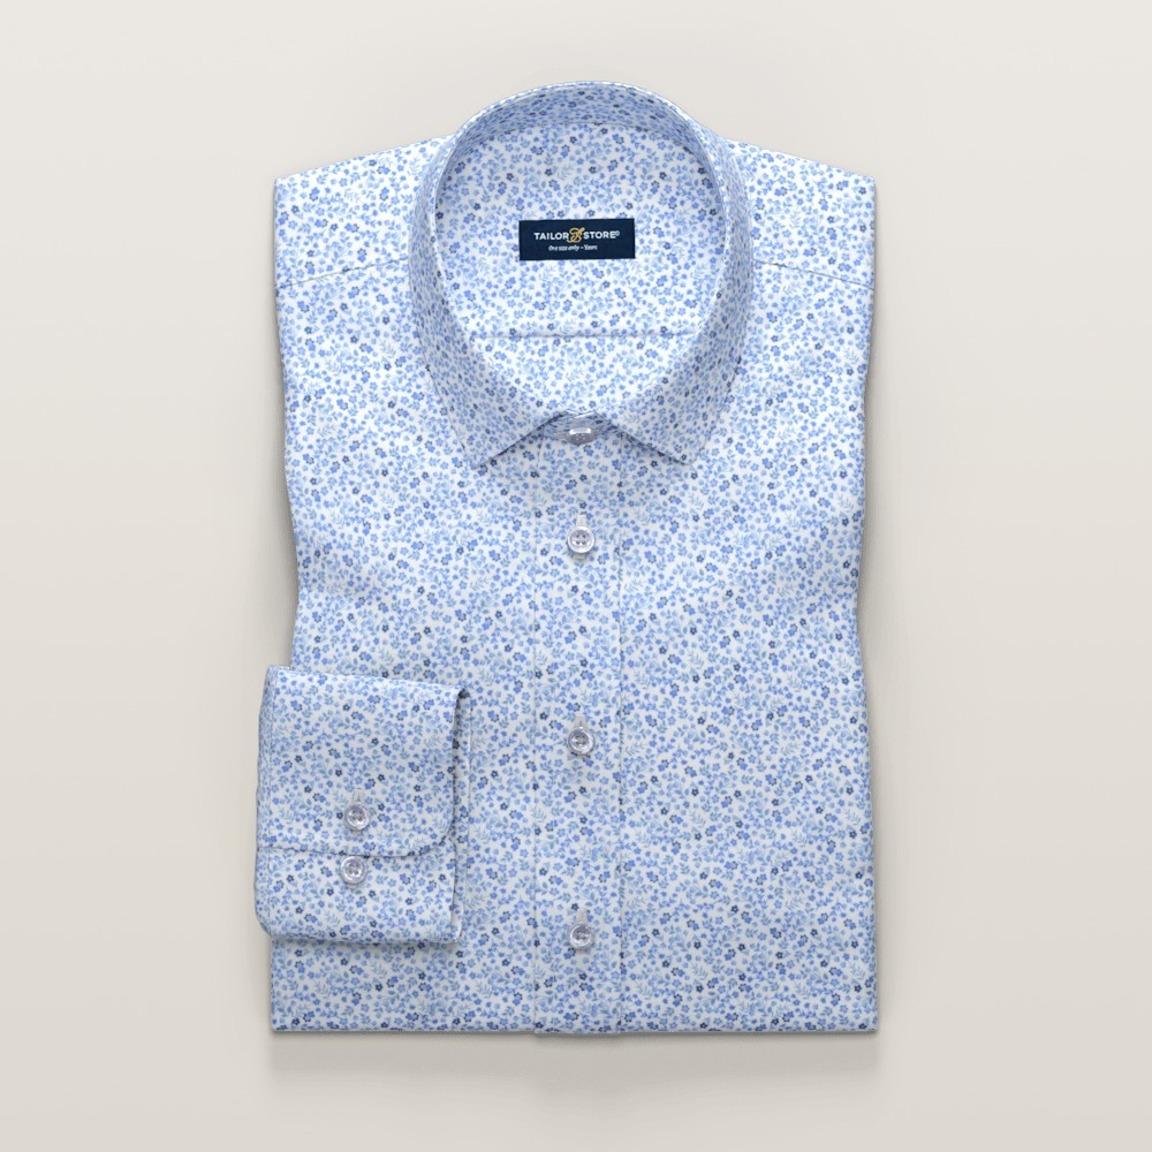 Light blue printed dress shirt